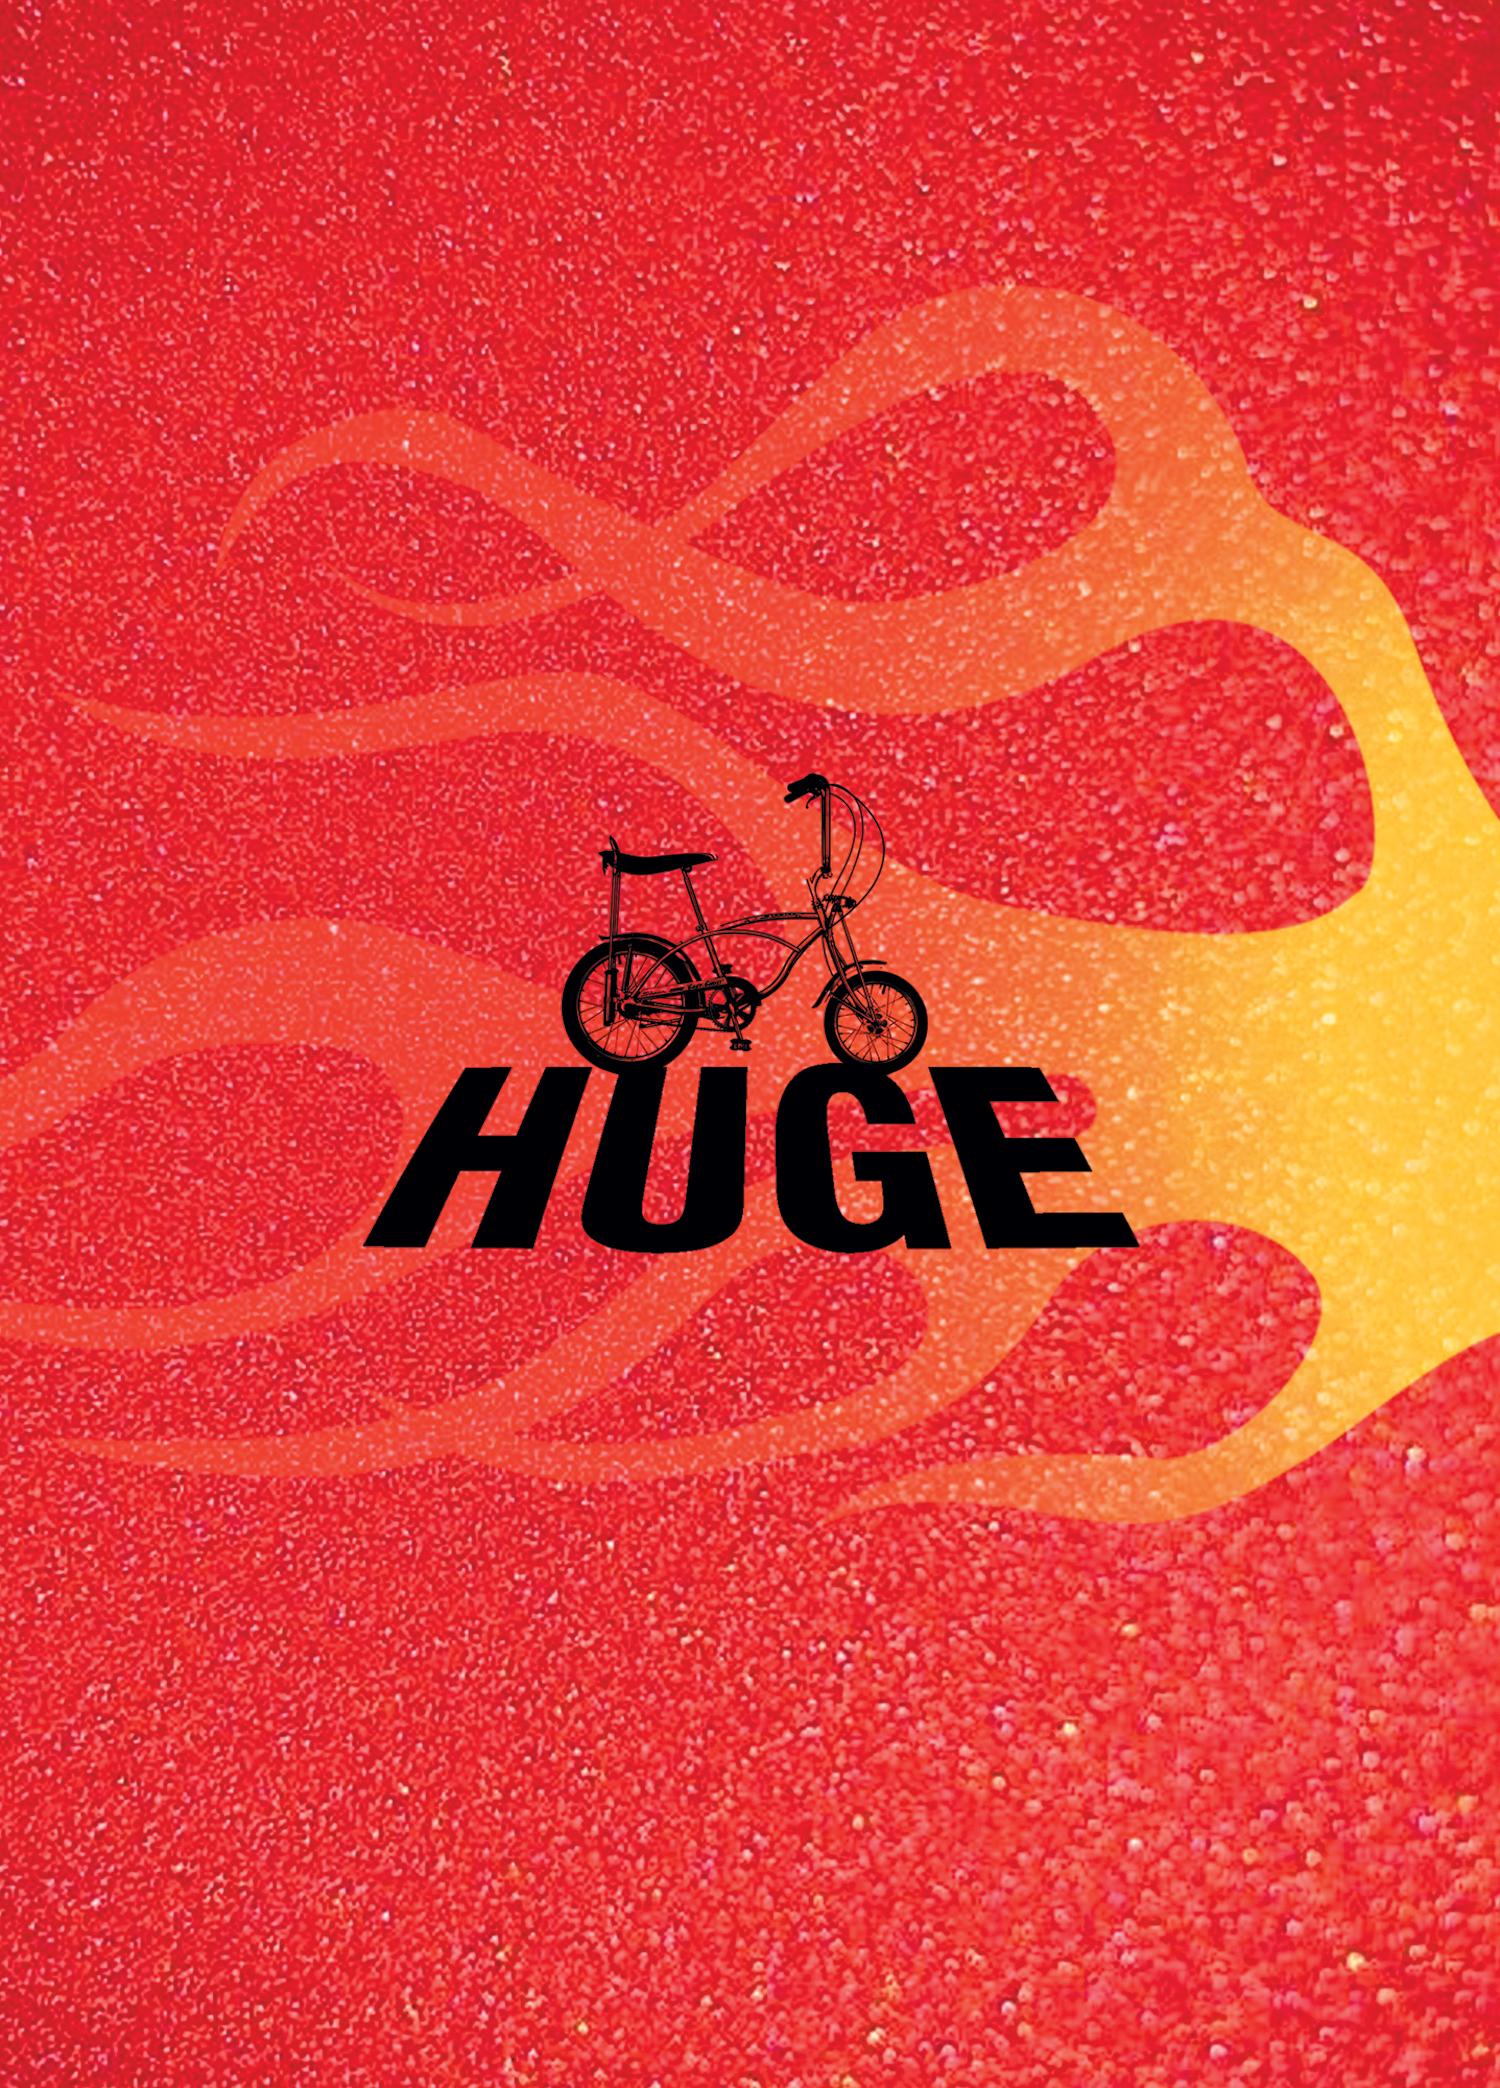 HUGE-comp-art-ss6.jpg